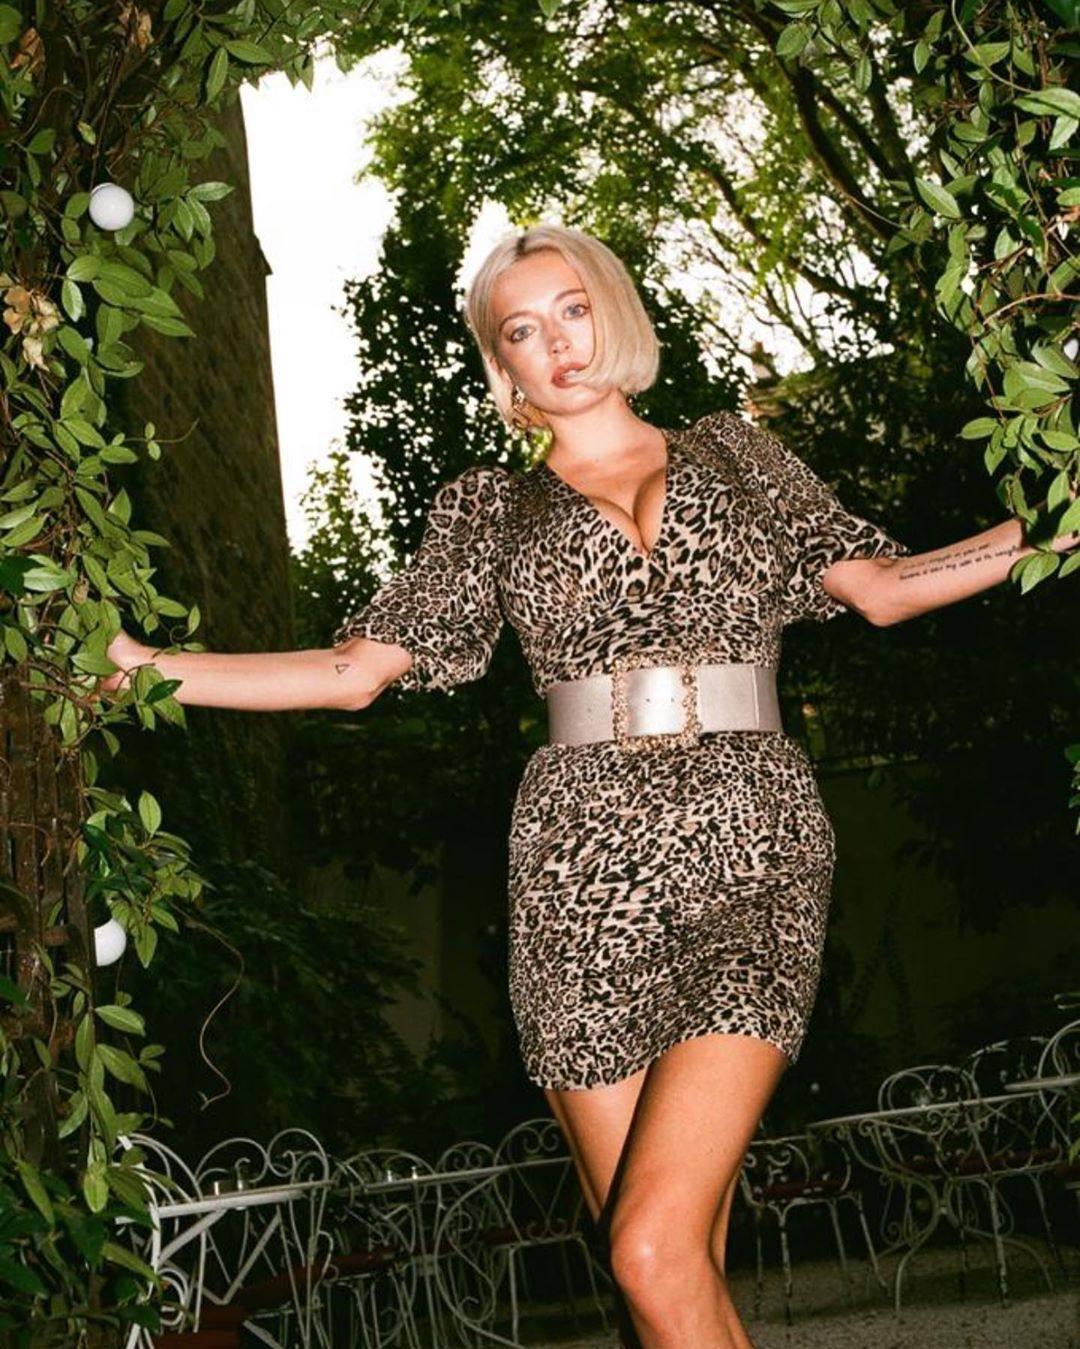 Caroline Vreeland – Sexy Big Boobs In Big Cleavage 0005